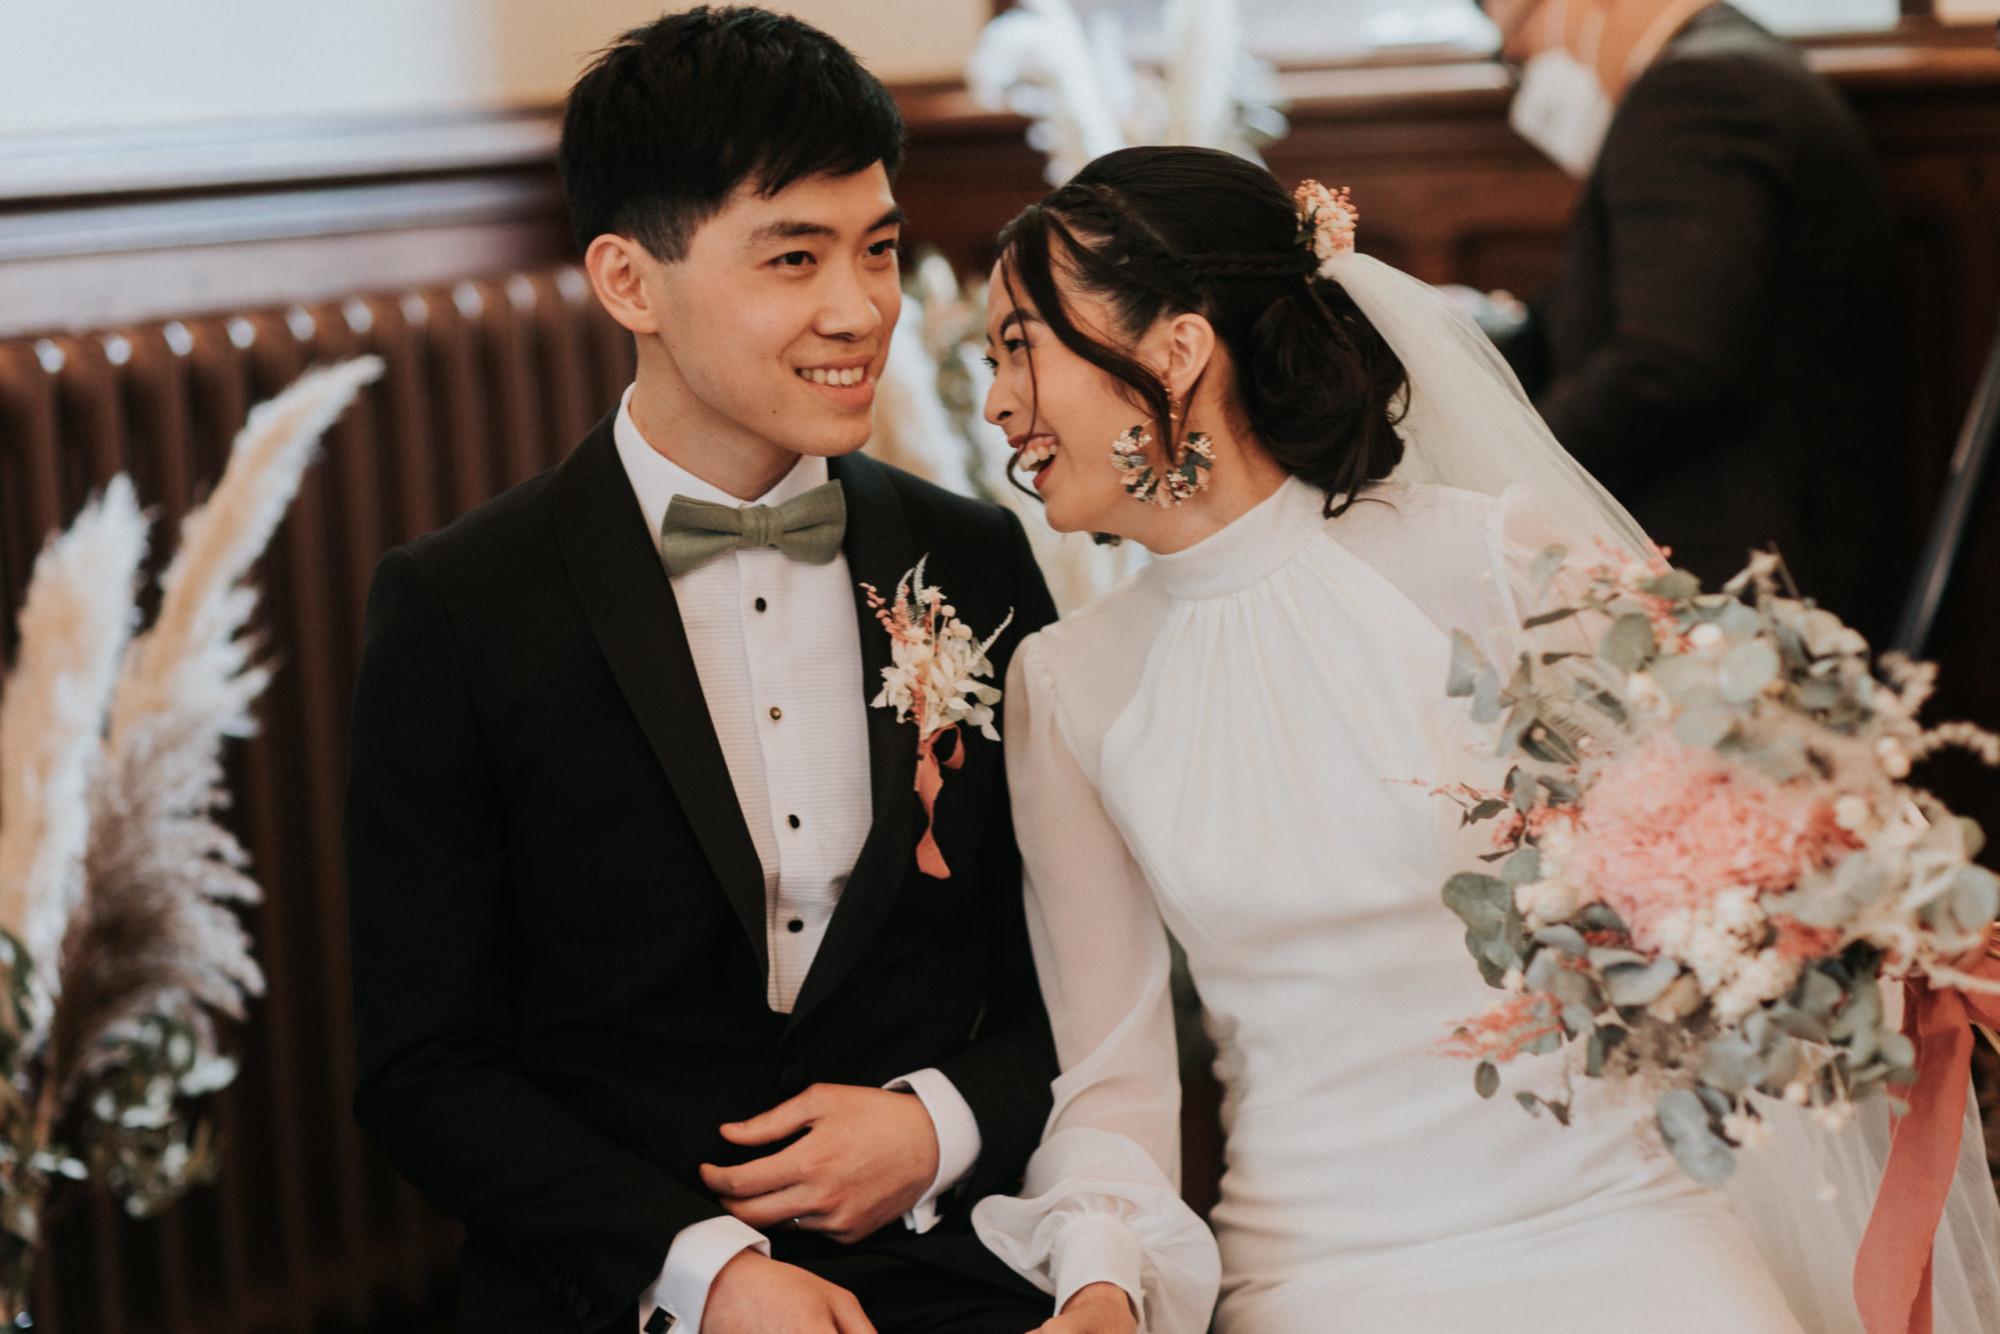 cérémonie mariage, couple, fleuriste, décor de cérémonie, mariage Yvelines